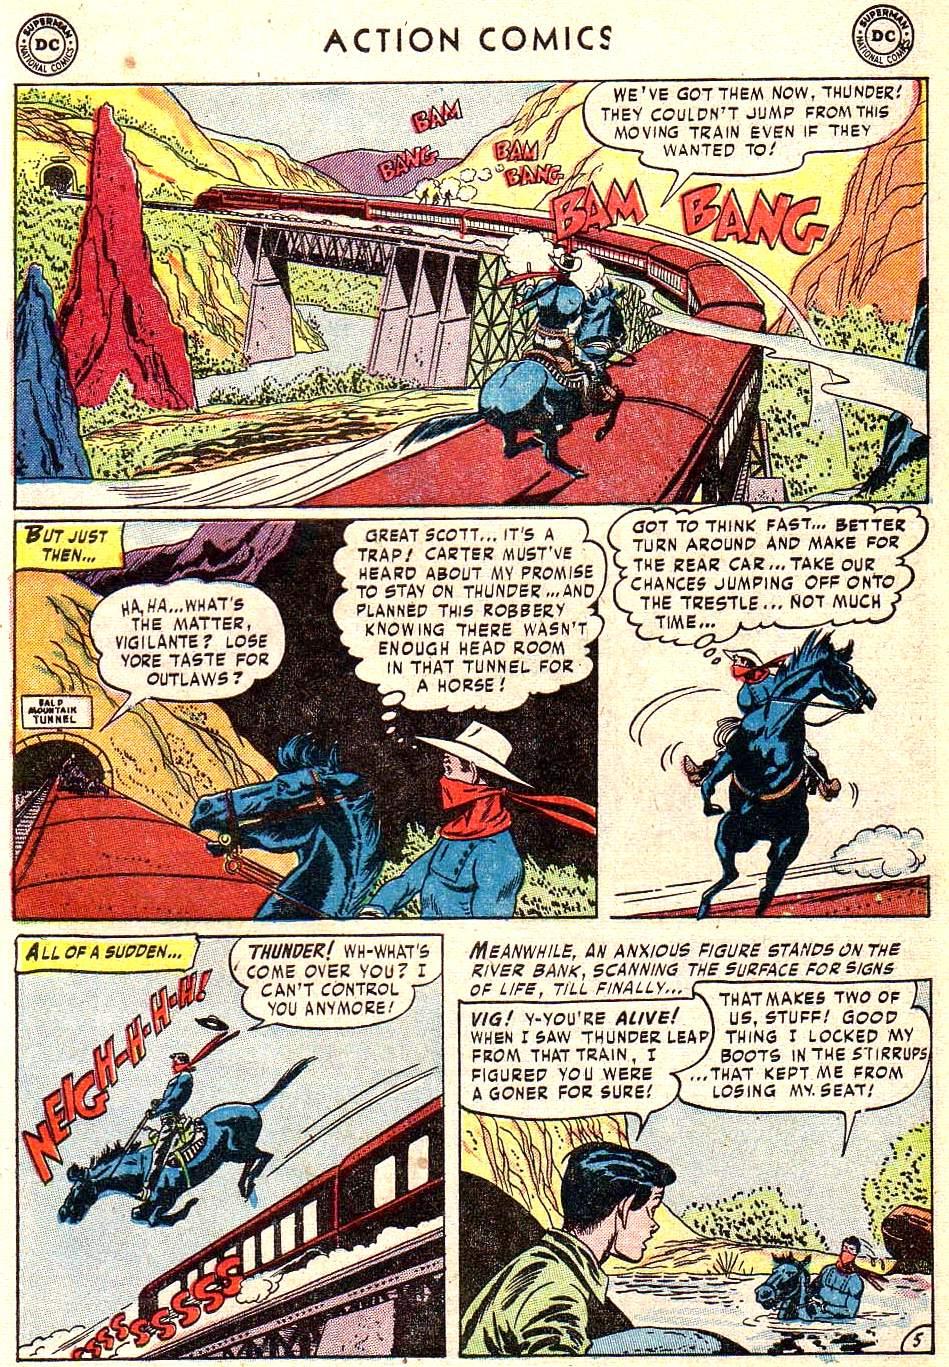 Action Comics (1938) 172 Page 38